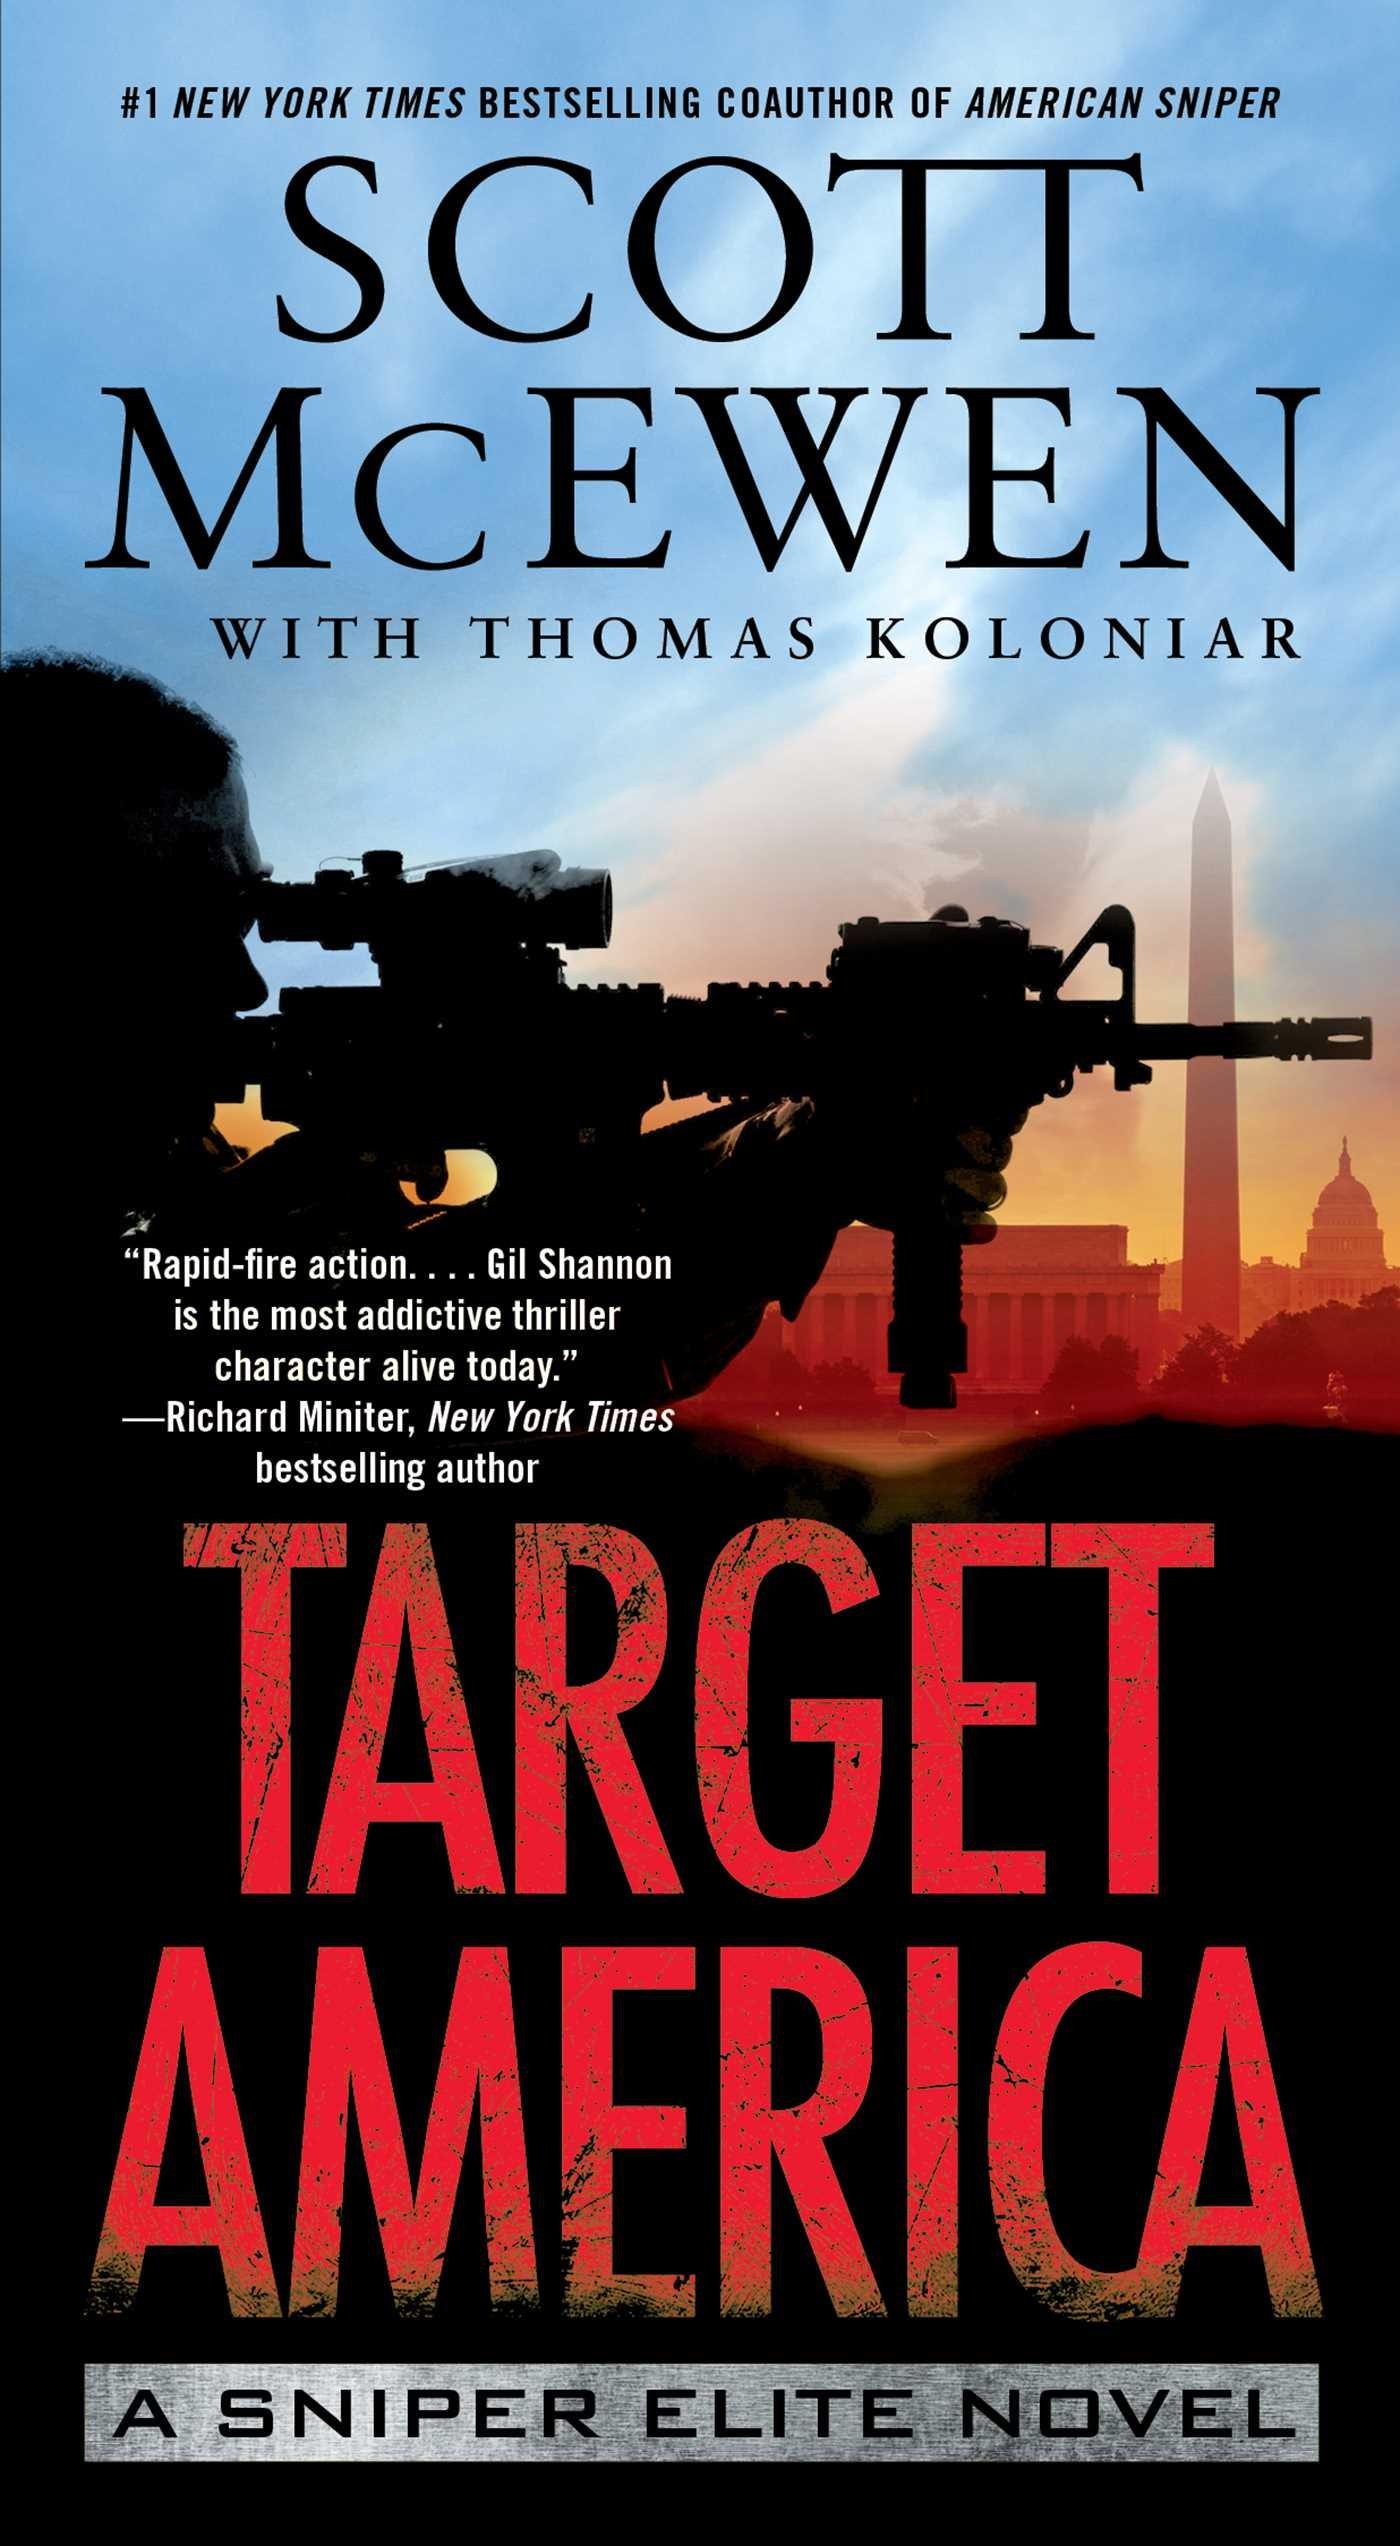 Amazon target america a sniper elite novel 9781476747200 amazon target america a sniper elite novel 9781476747200 scott mcewen thomas koloniar books fandeluxe Gallery